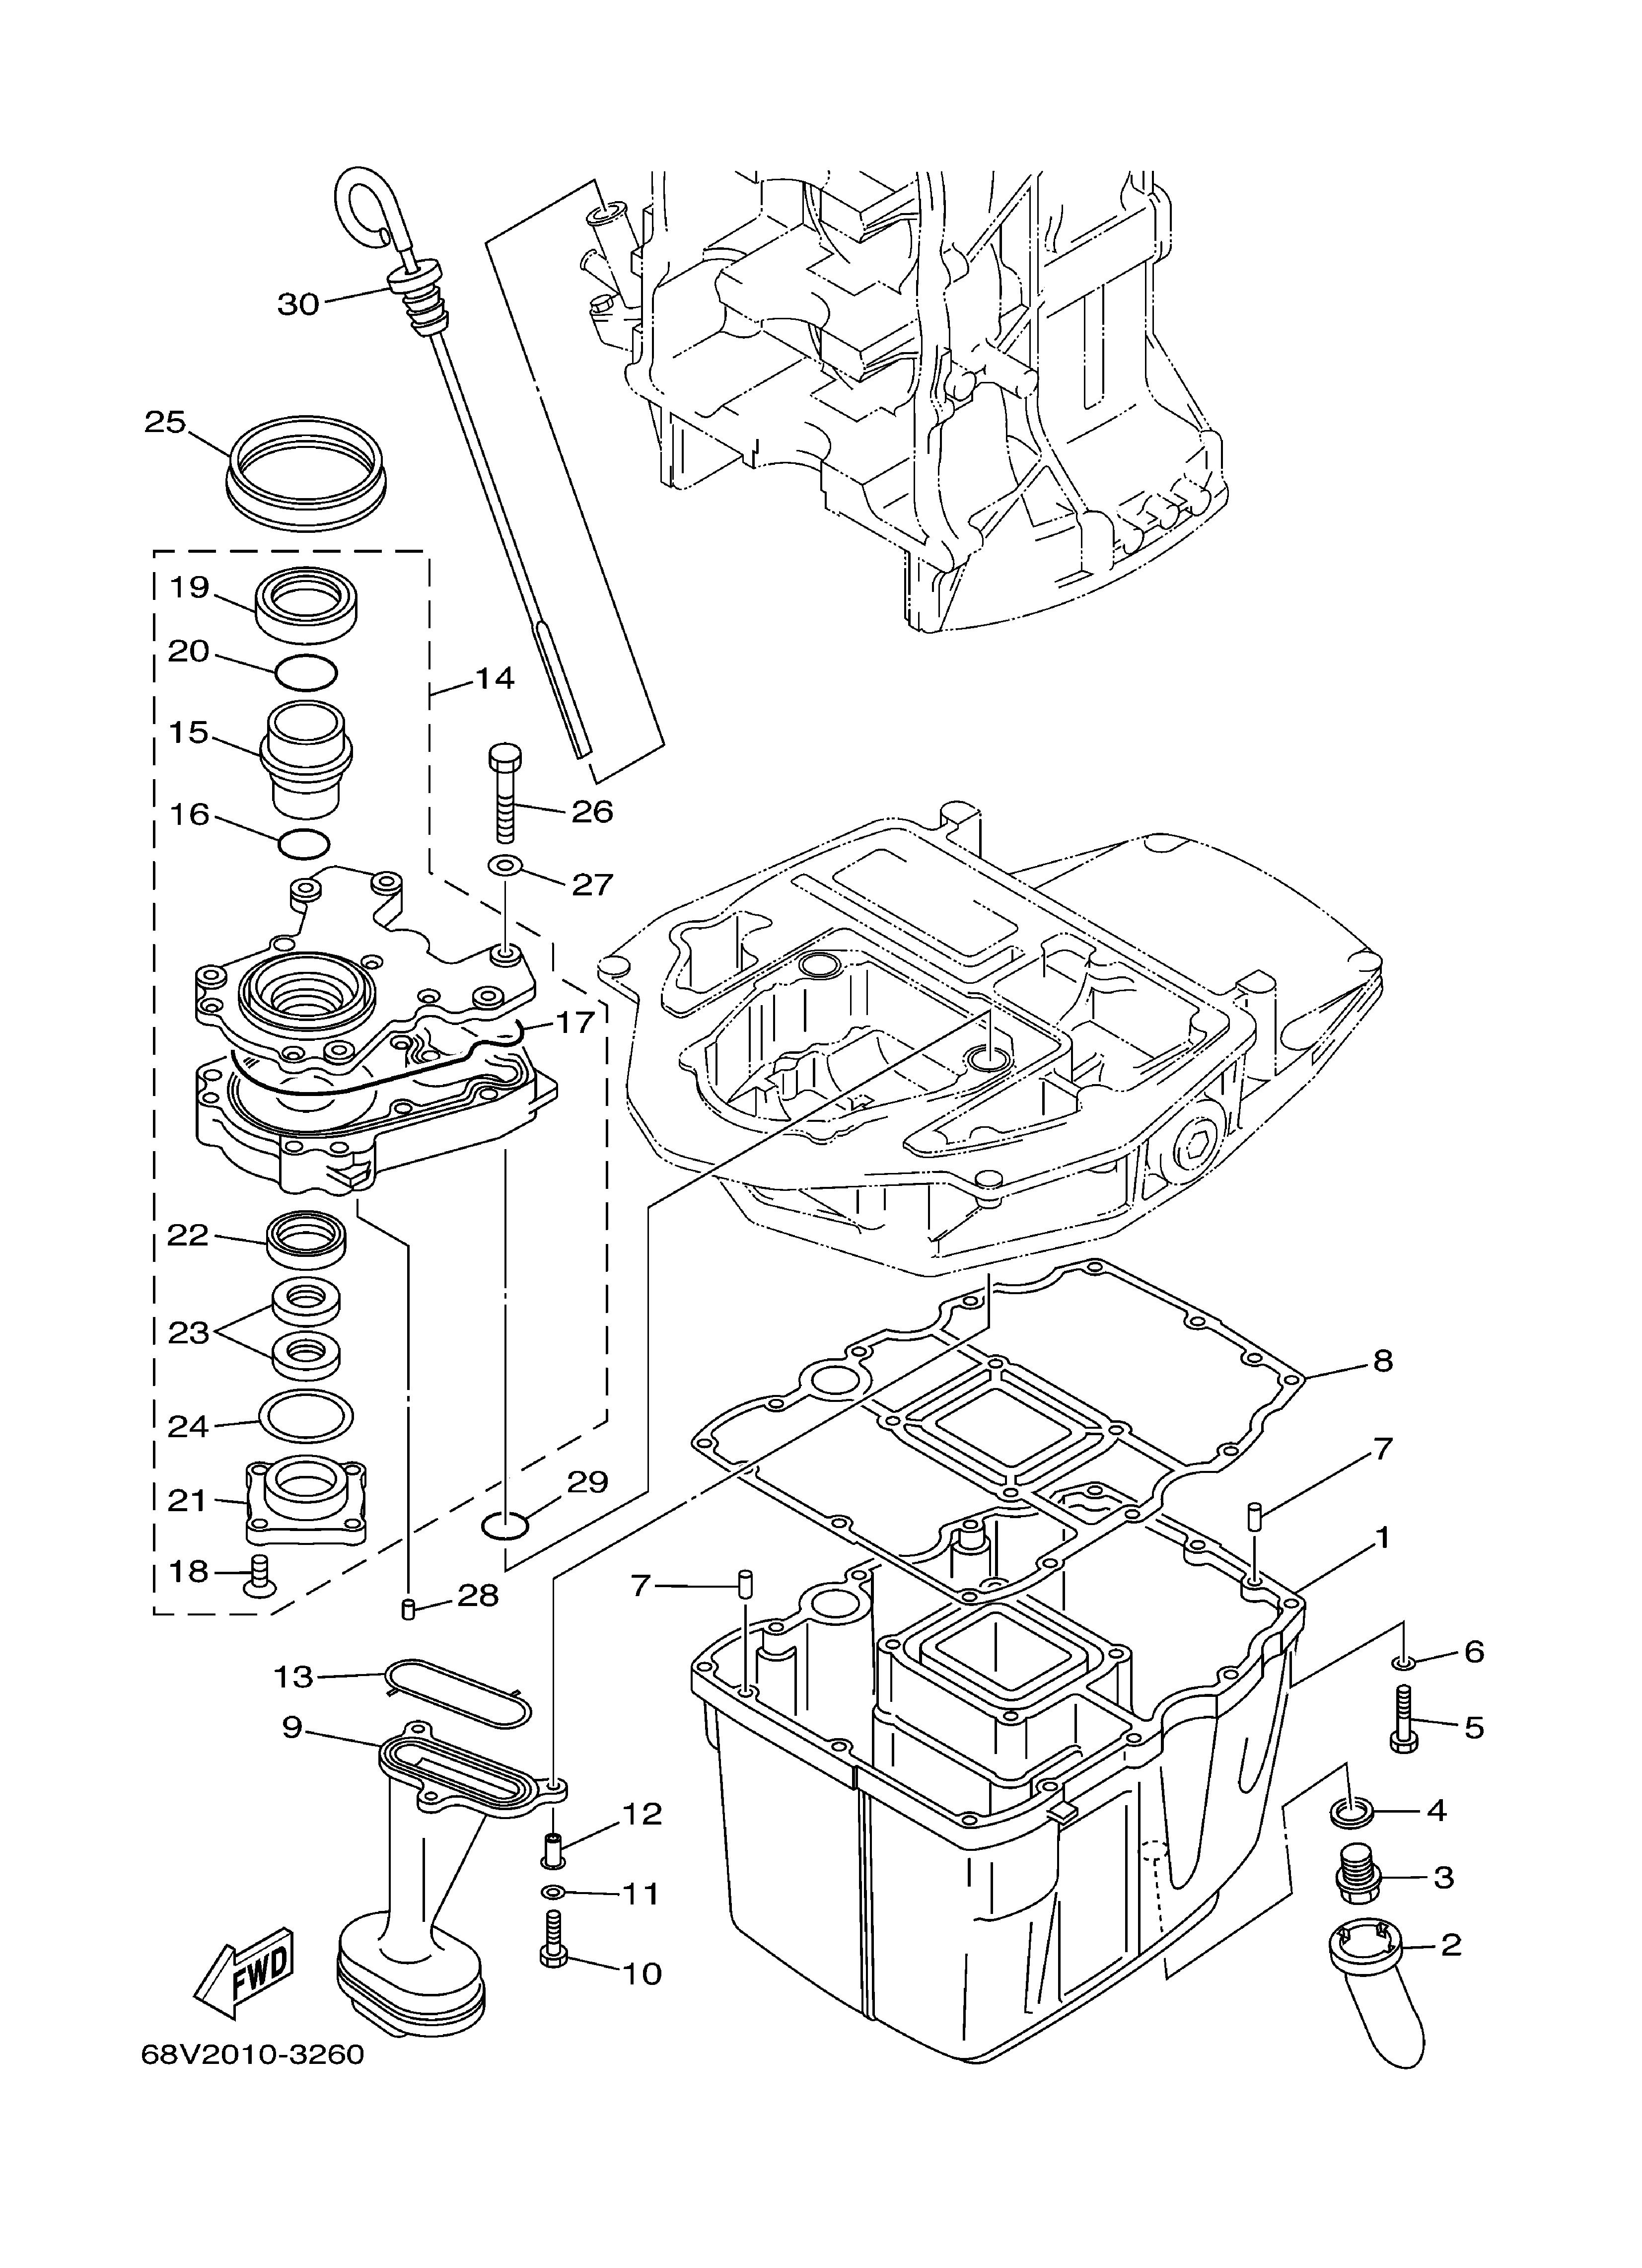 2005 ford escape coolant temperature sending unit location